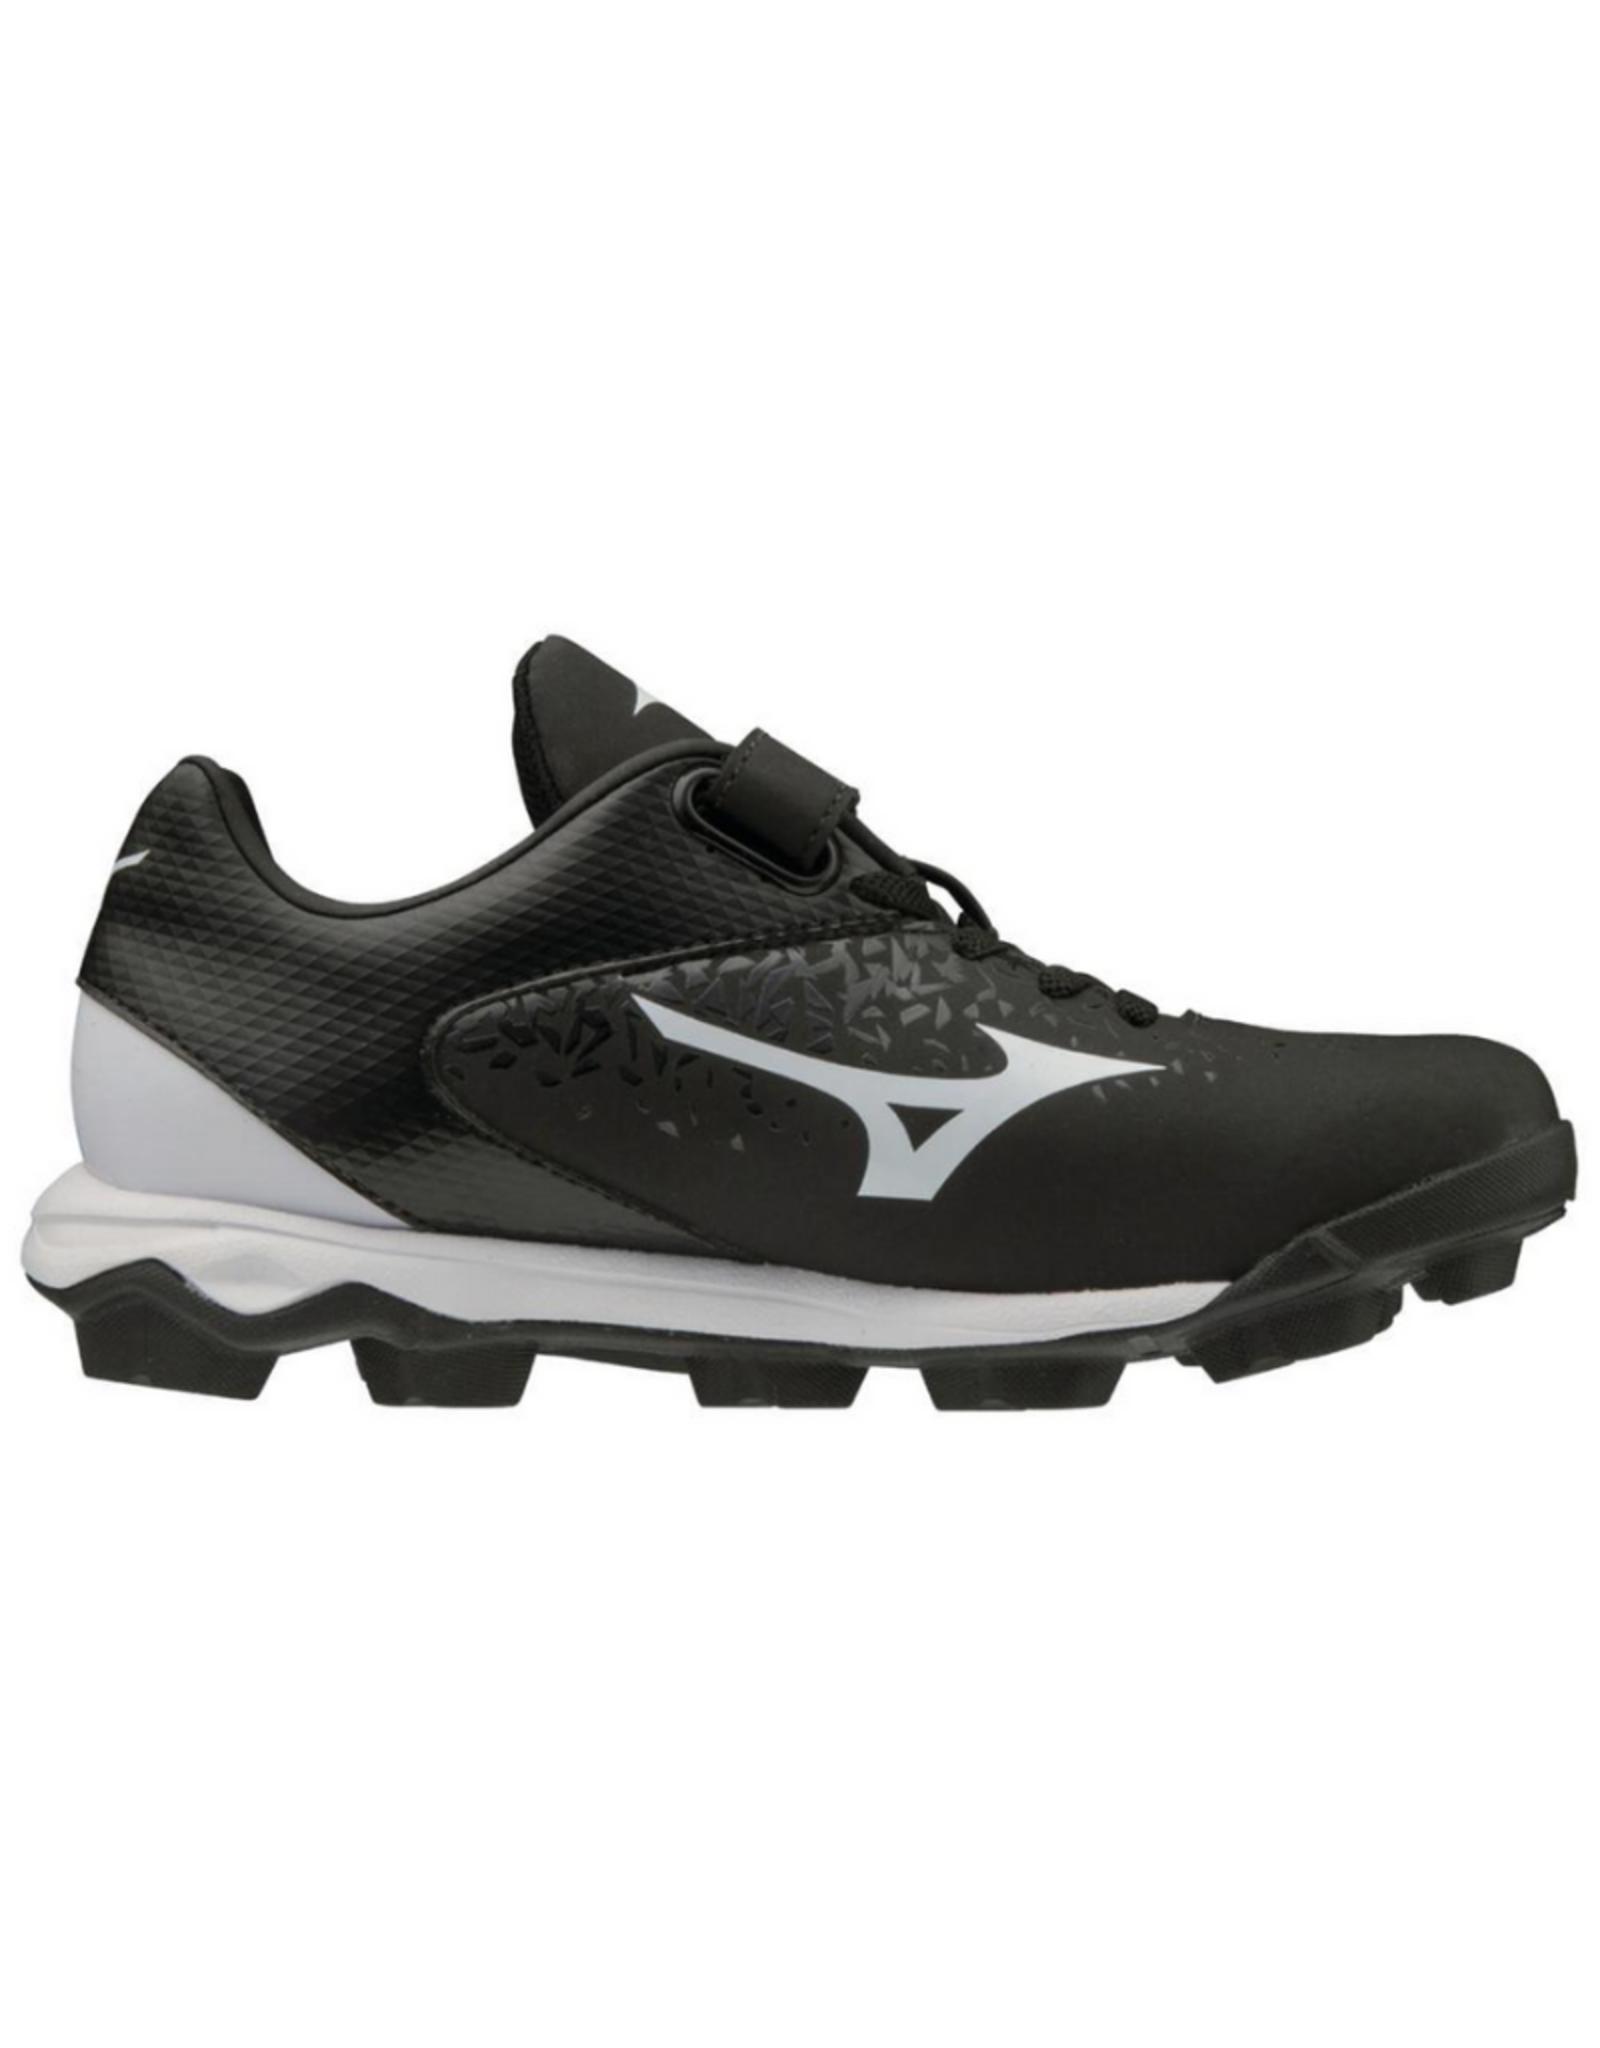 Mizuno Wave Finch Select 9 Jr. Softball Cleat Black/White